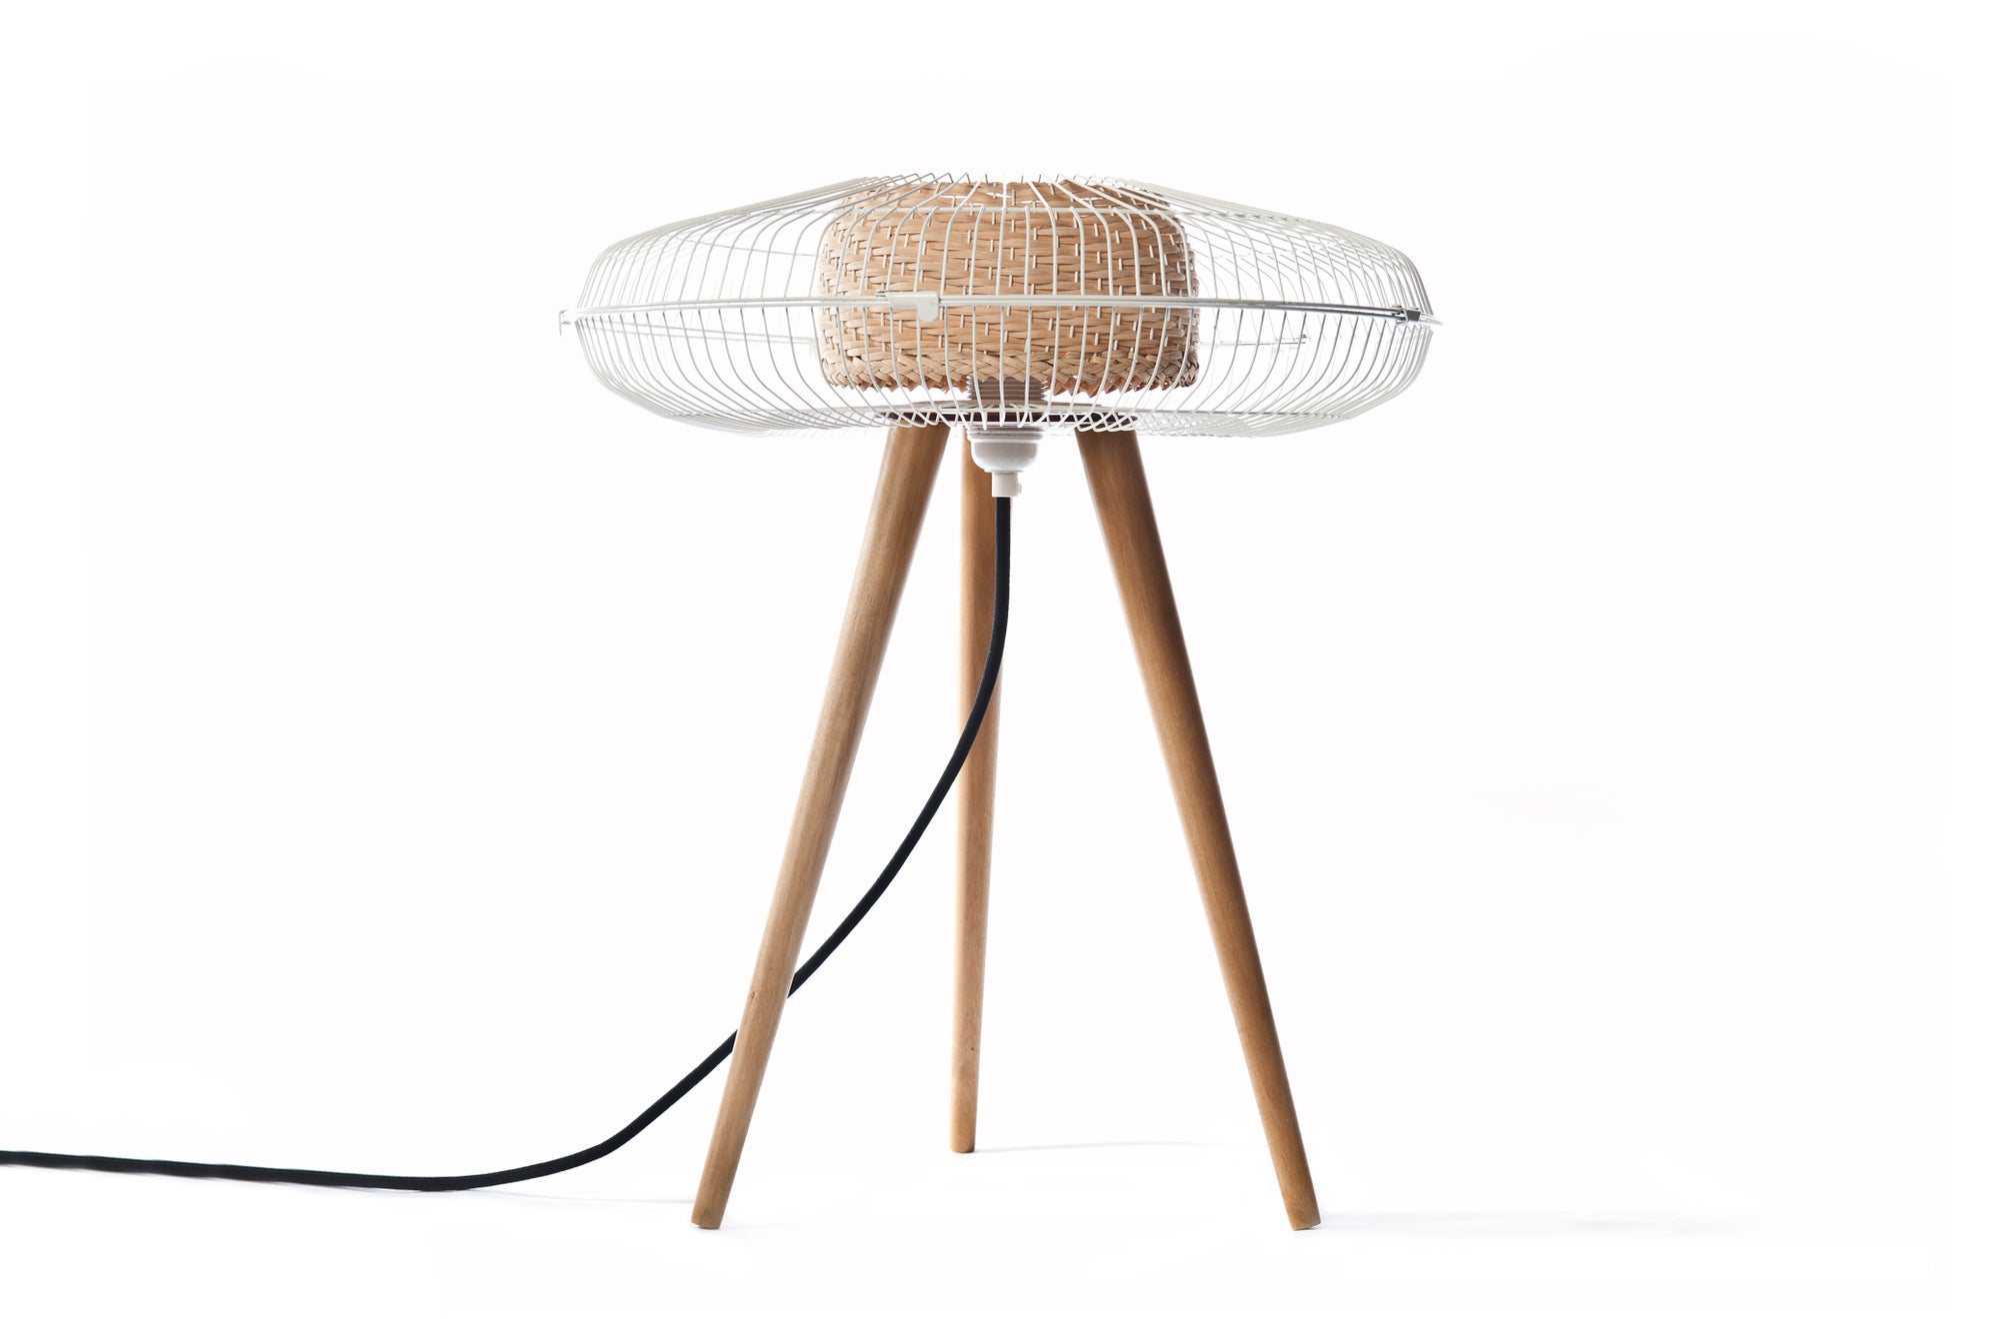 Image of FAN table lamp~